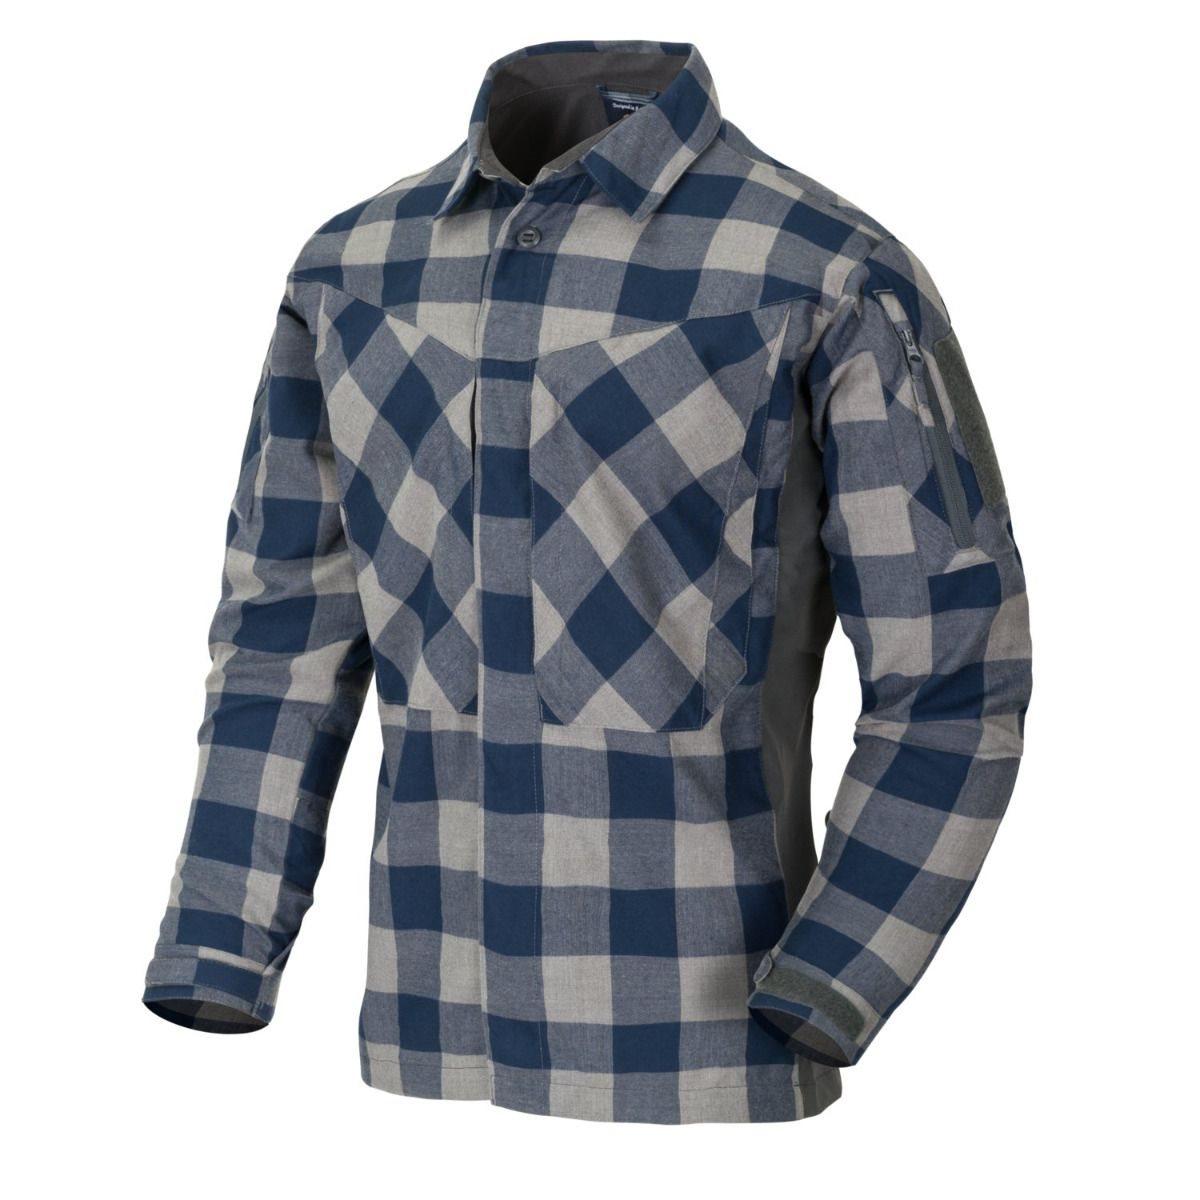 Košile MBDU flanel SLATE BLUE CHECKERED Helikon-Tex® KO-MBD-PO-C0 L-11